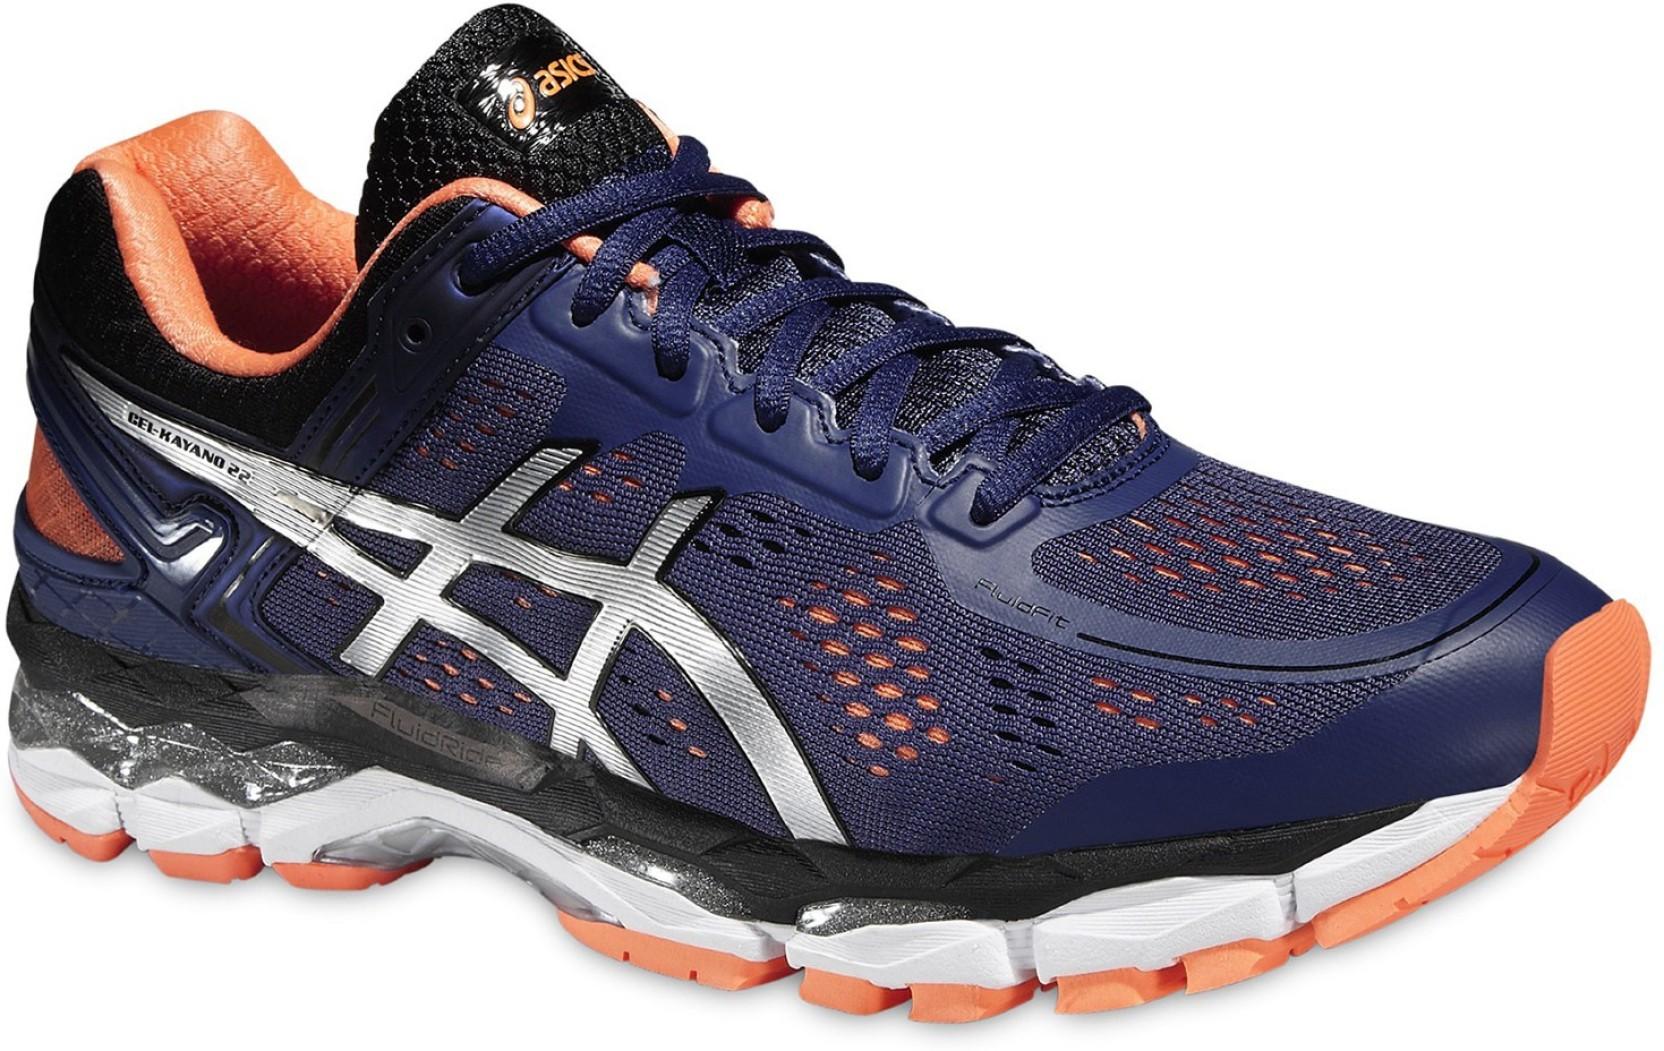 4d12ba1475d7 Asics Gel-Kayano 22 Men Running Shoes For Men - Buy Deep Cobalt ...